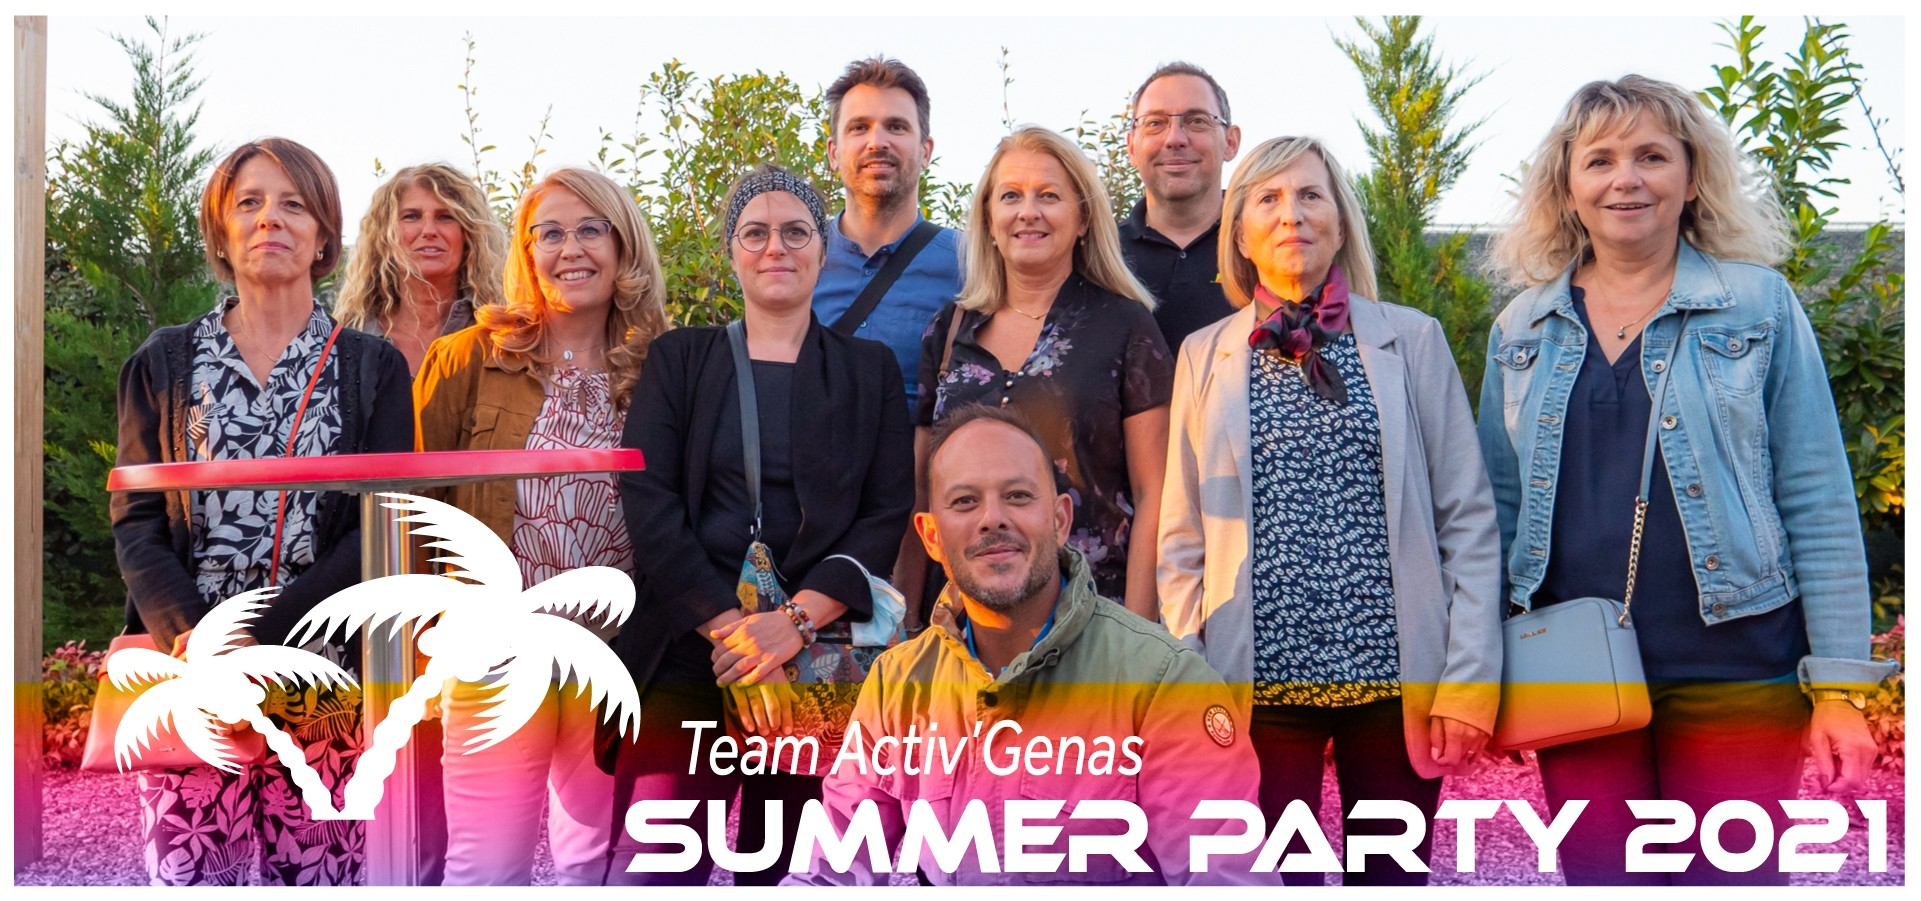 Summer Party Split Factory Activ GEnas